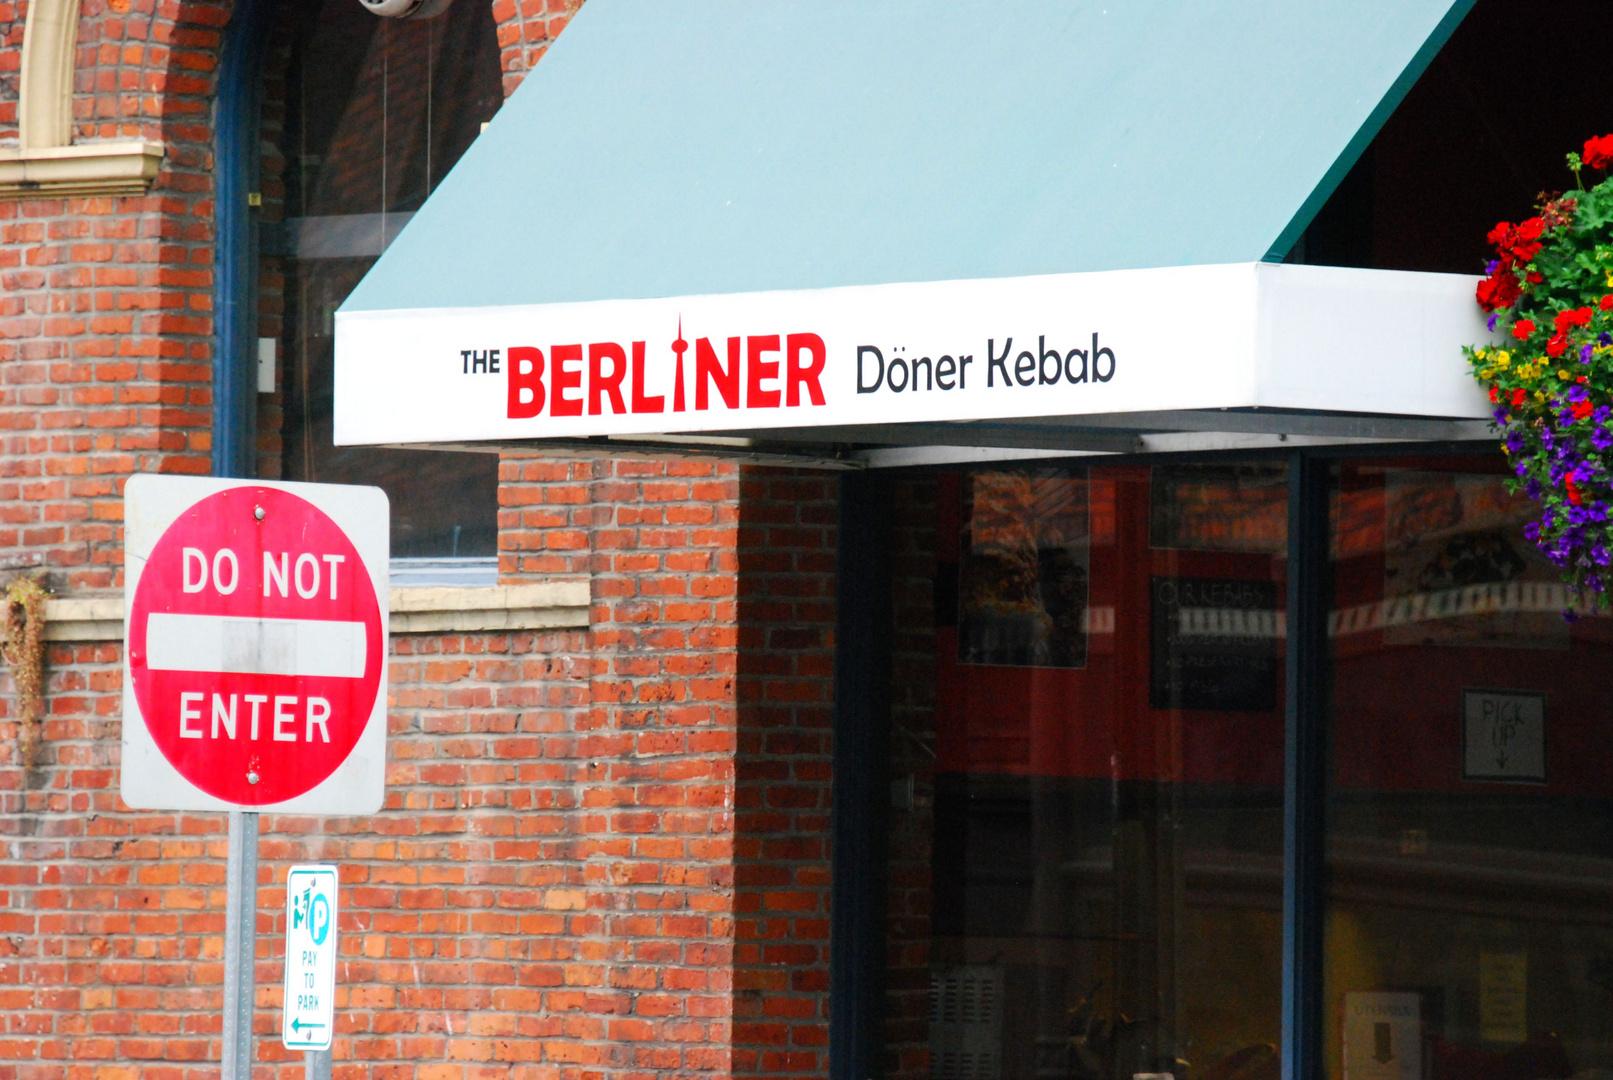 Do not enter the Berliner Döner Kebab